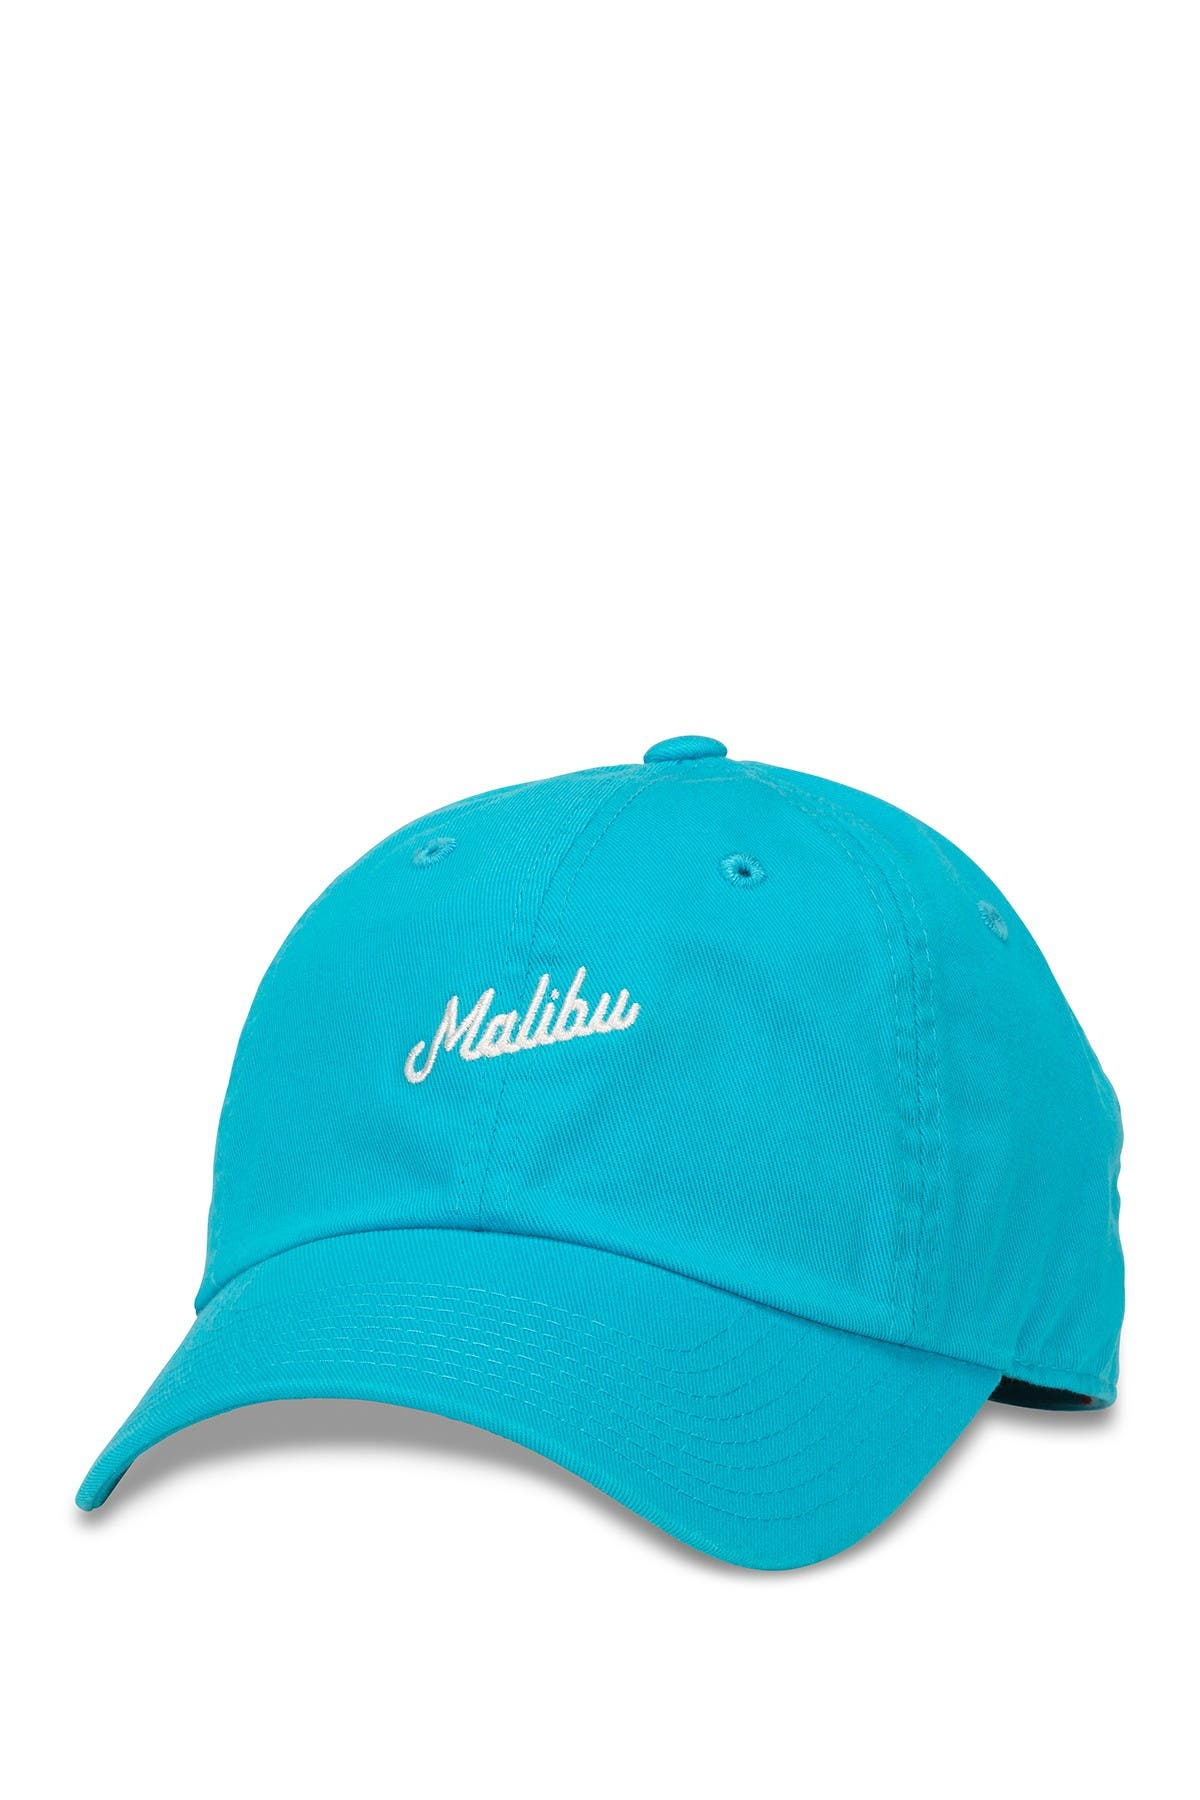 Image of American Needle Malibu Embroidered Baseball Cap